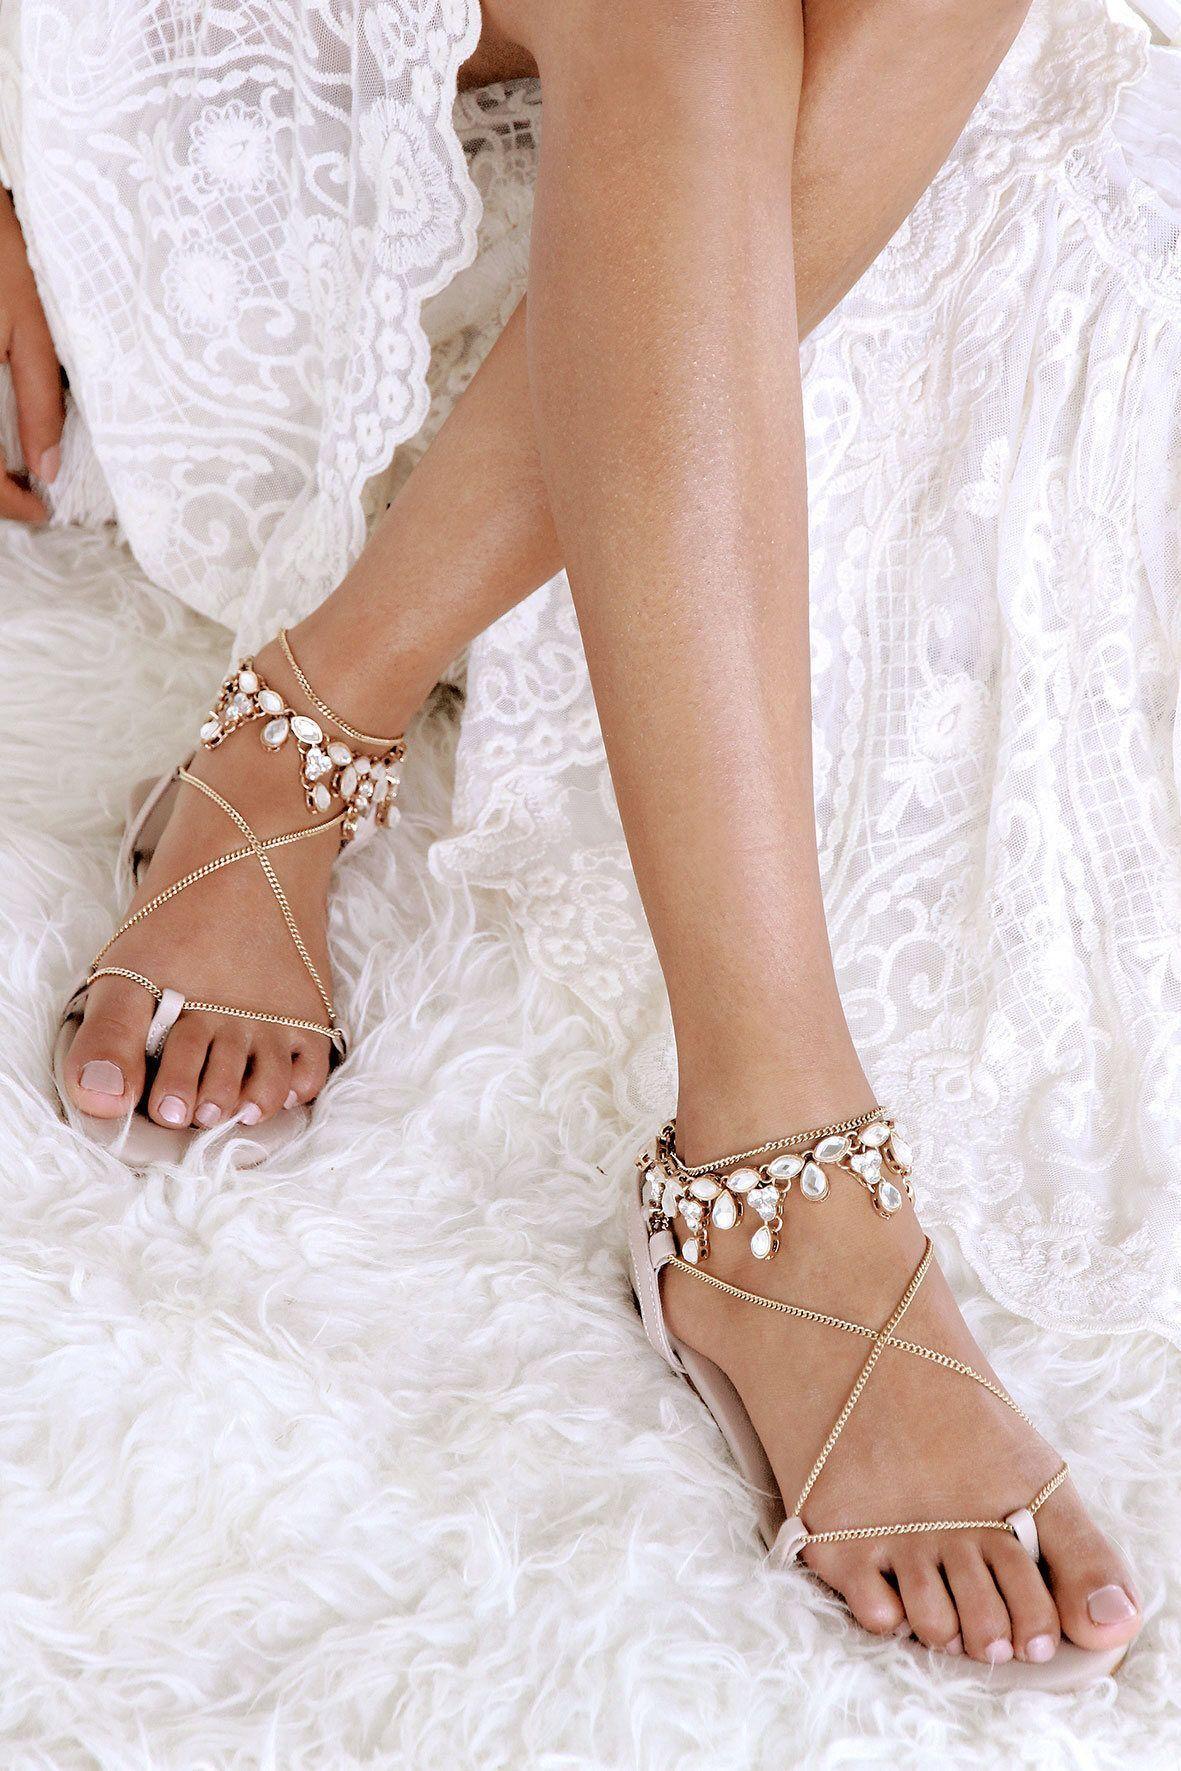 30 Stylish Summer Wedding Shoes That Inspire Weddinginclude Wedding Shoes Flats Sandals Summer Wedding Shoes Wedding Shoes Comfortable